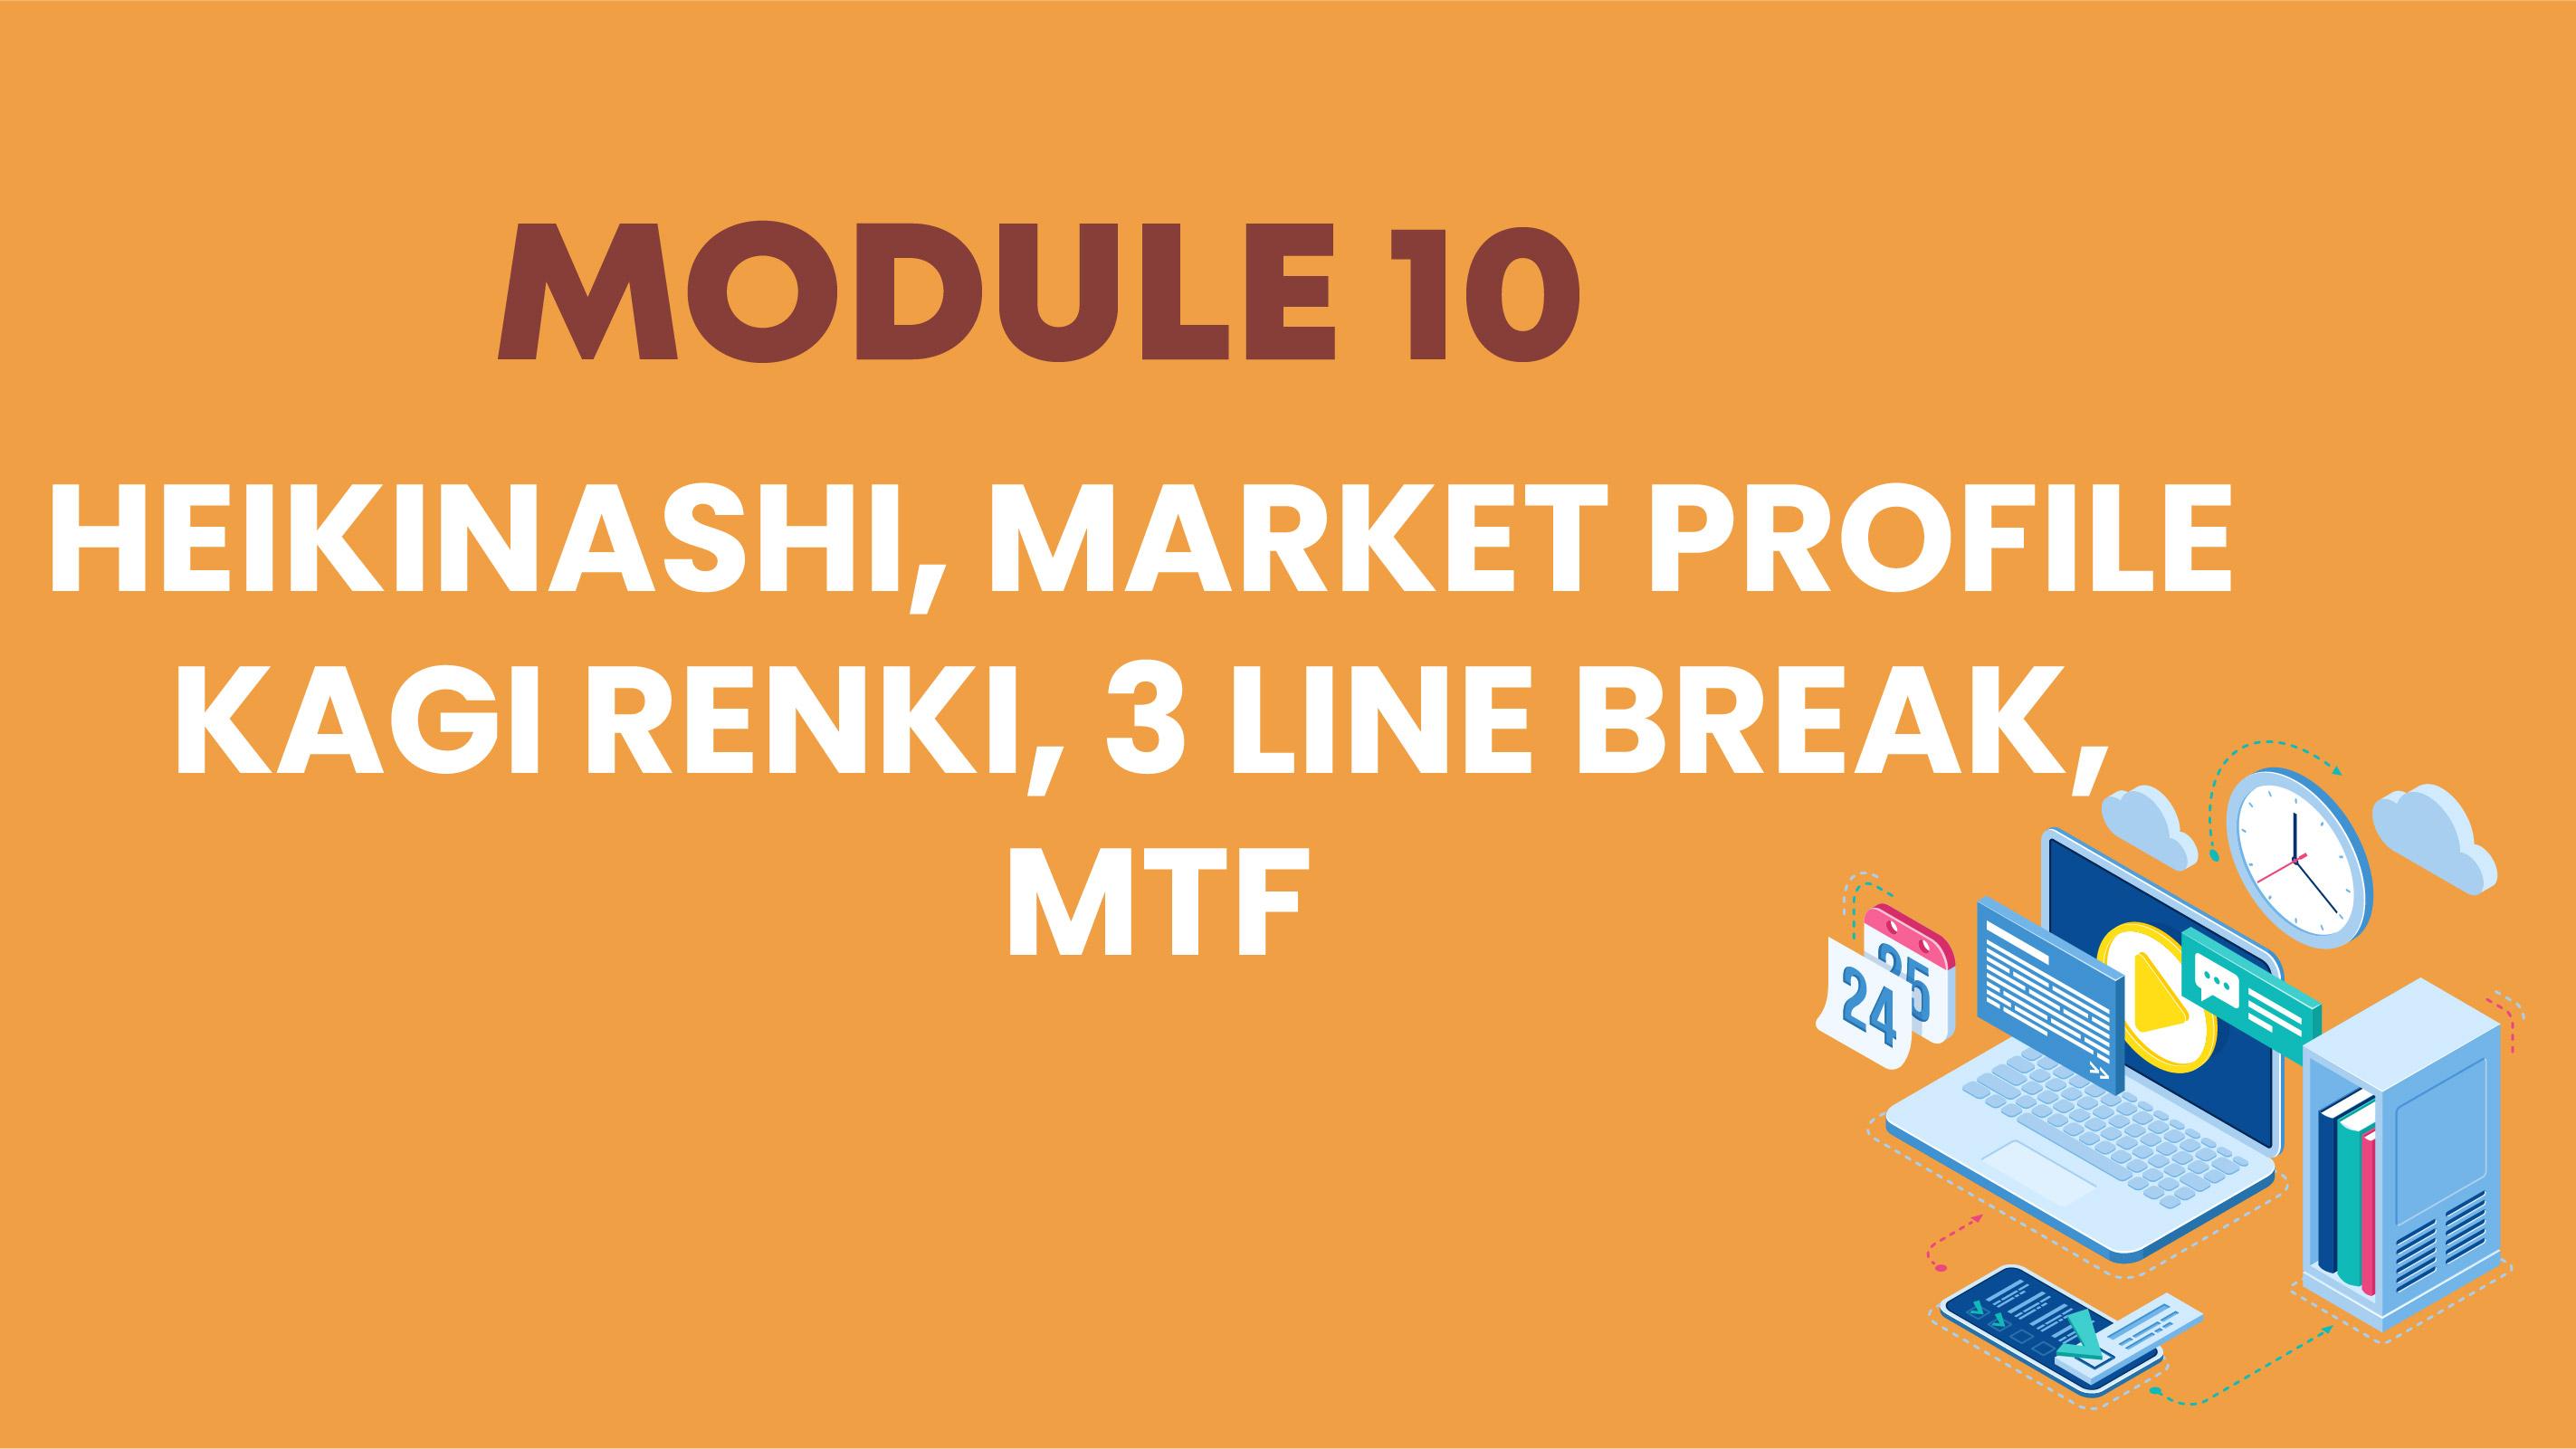 MODULE 10: HEIKINASHI, MARKET PROFILE KAGI RENKI, 3 LINE BREAK, MTF